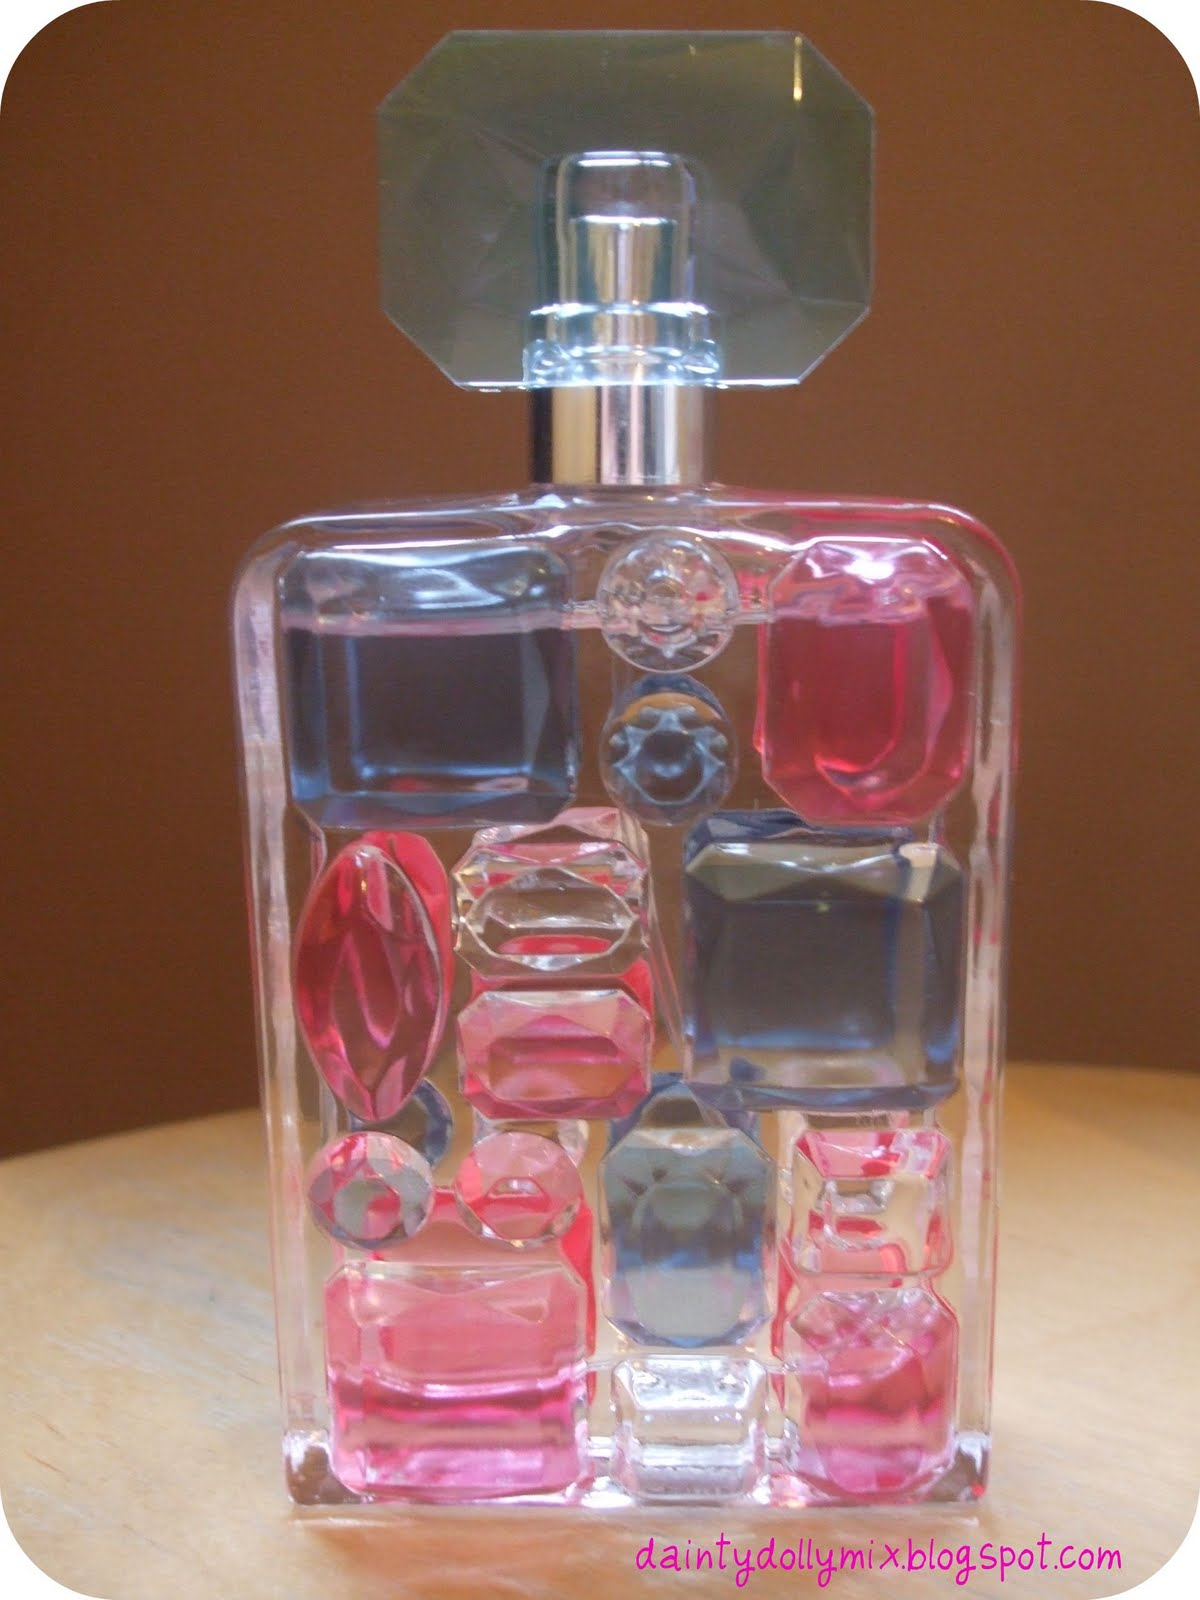 Dainty dollymix uk beauty blog new britney spears perfume for Britney spears perfume